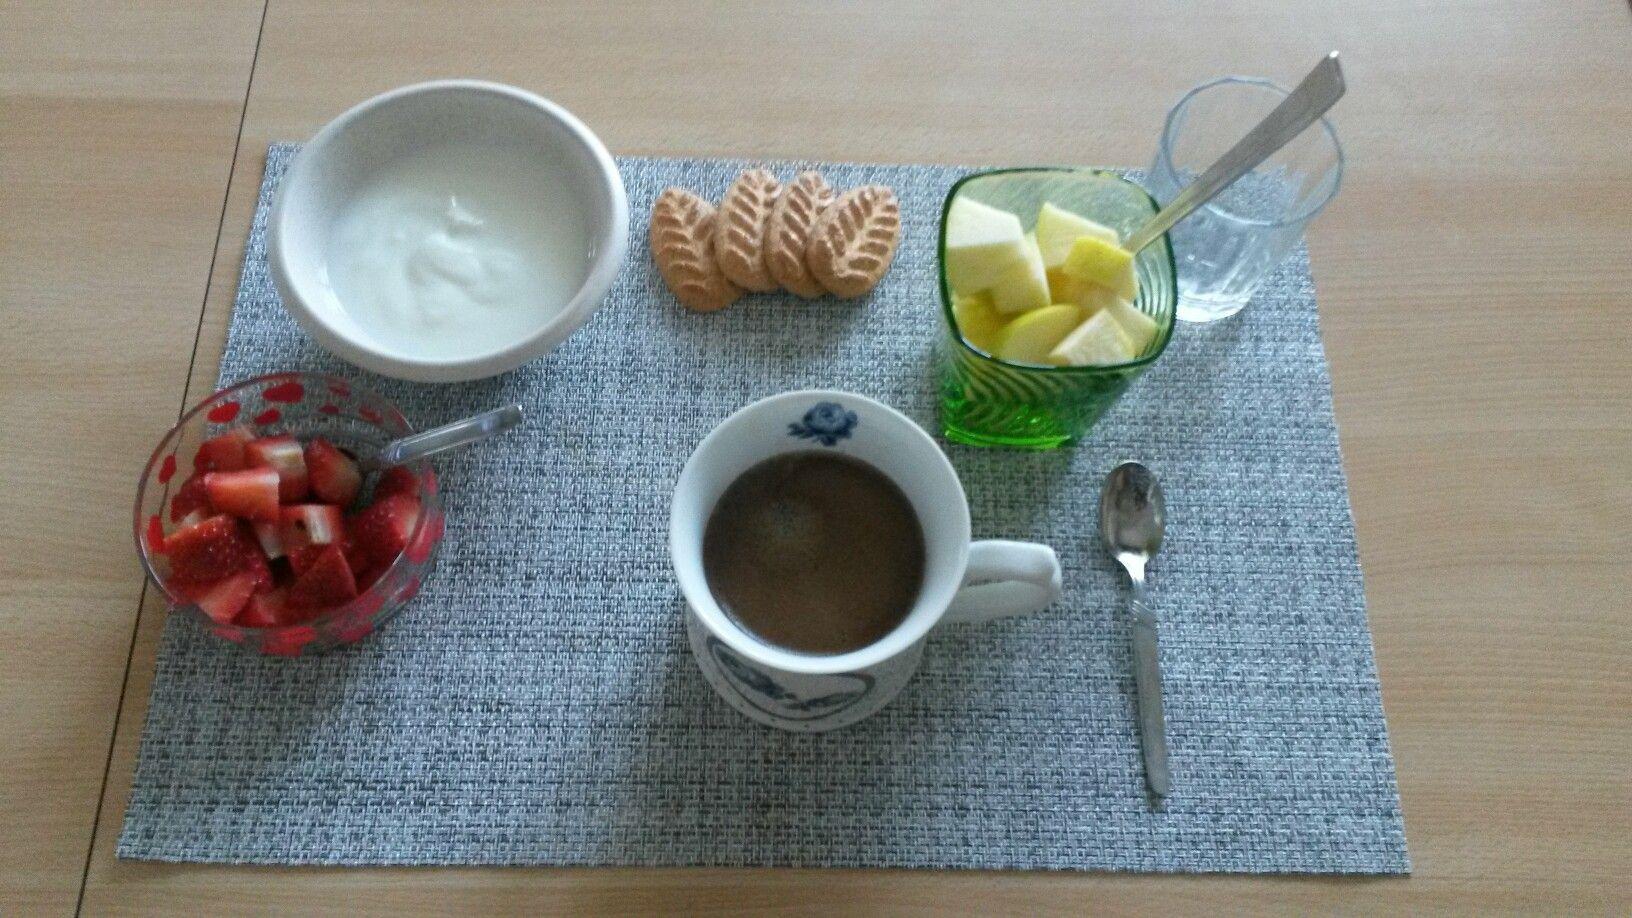 caffè #yogurt #fragole #mela #biscottimisura | Breakfast #time ...